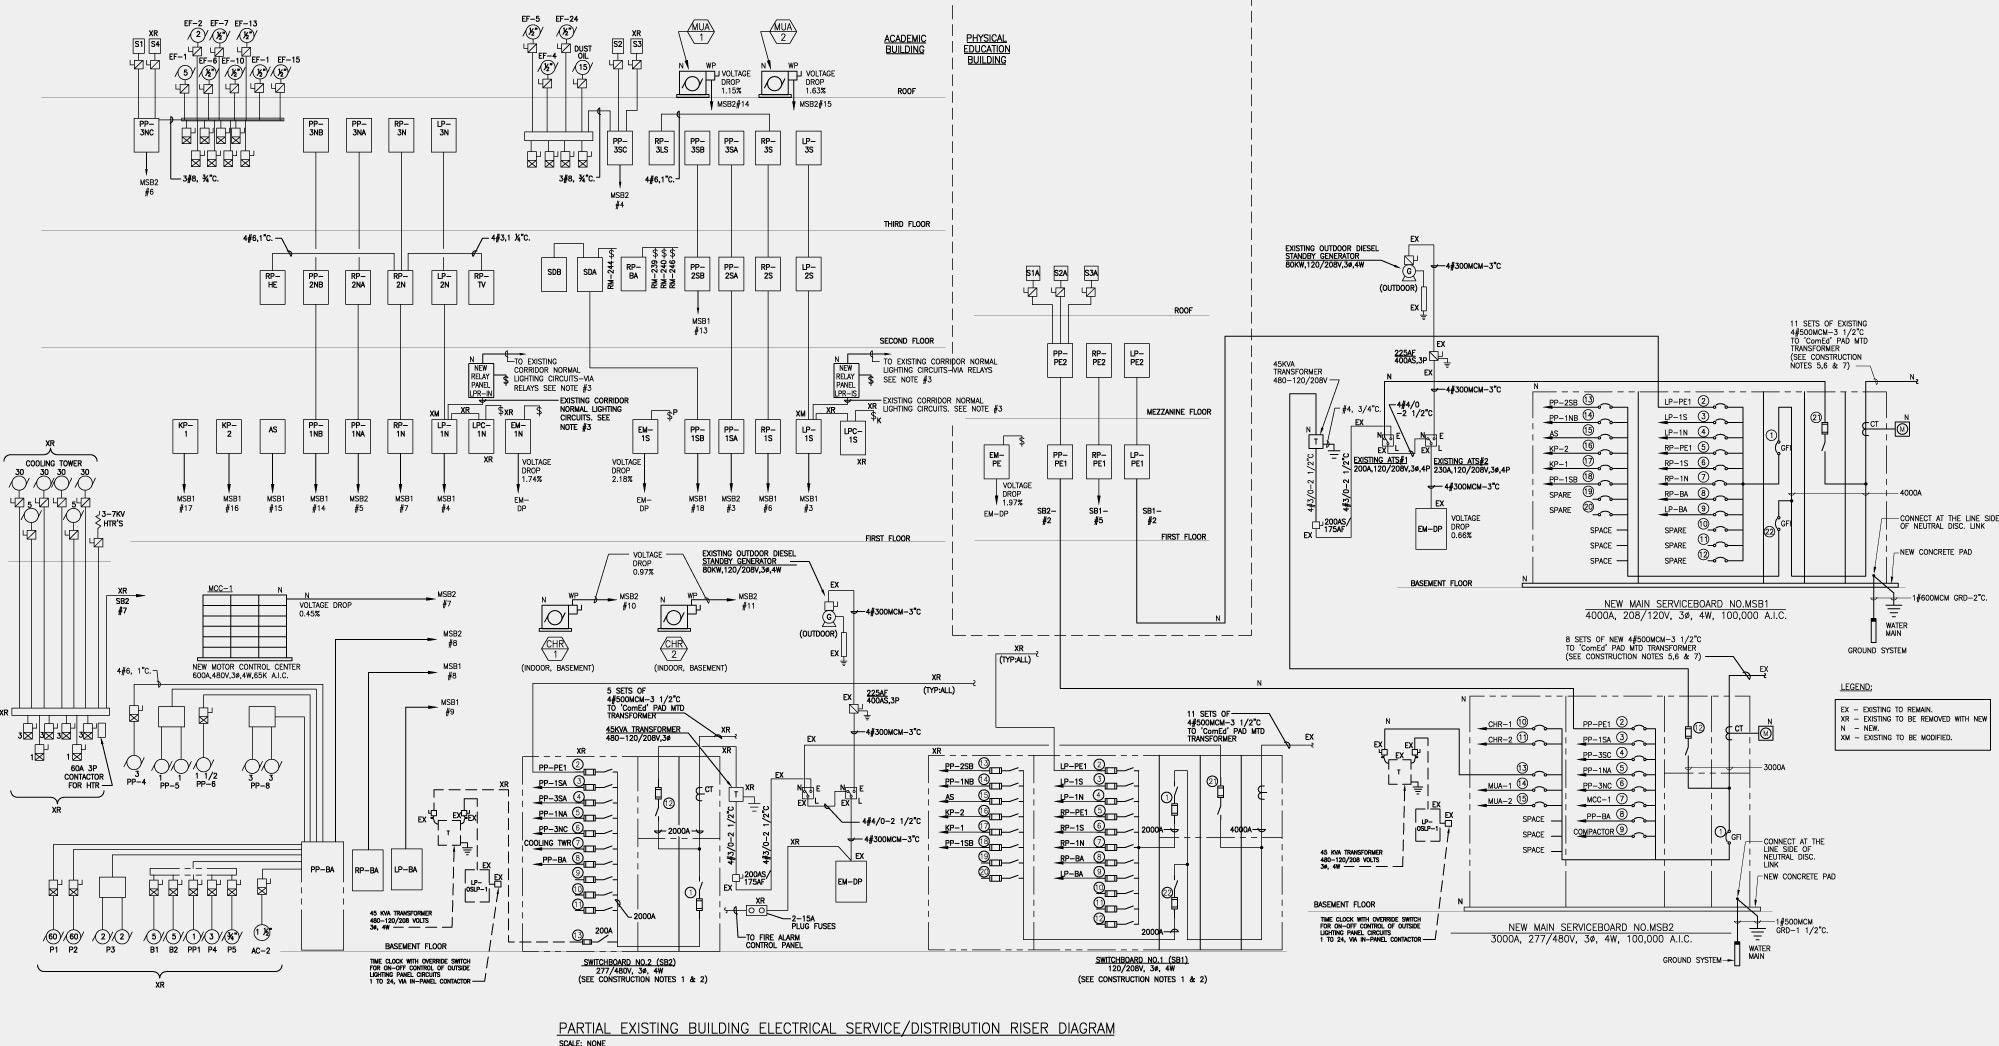 Sony Cdx Gt450u Wiring Diagram Sony XAV 61 Wiring Diagram